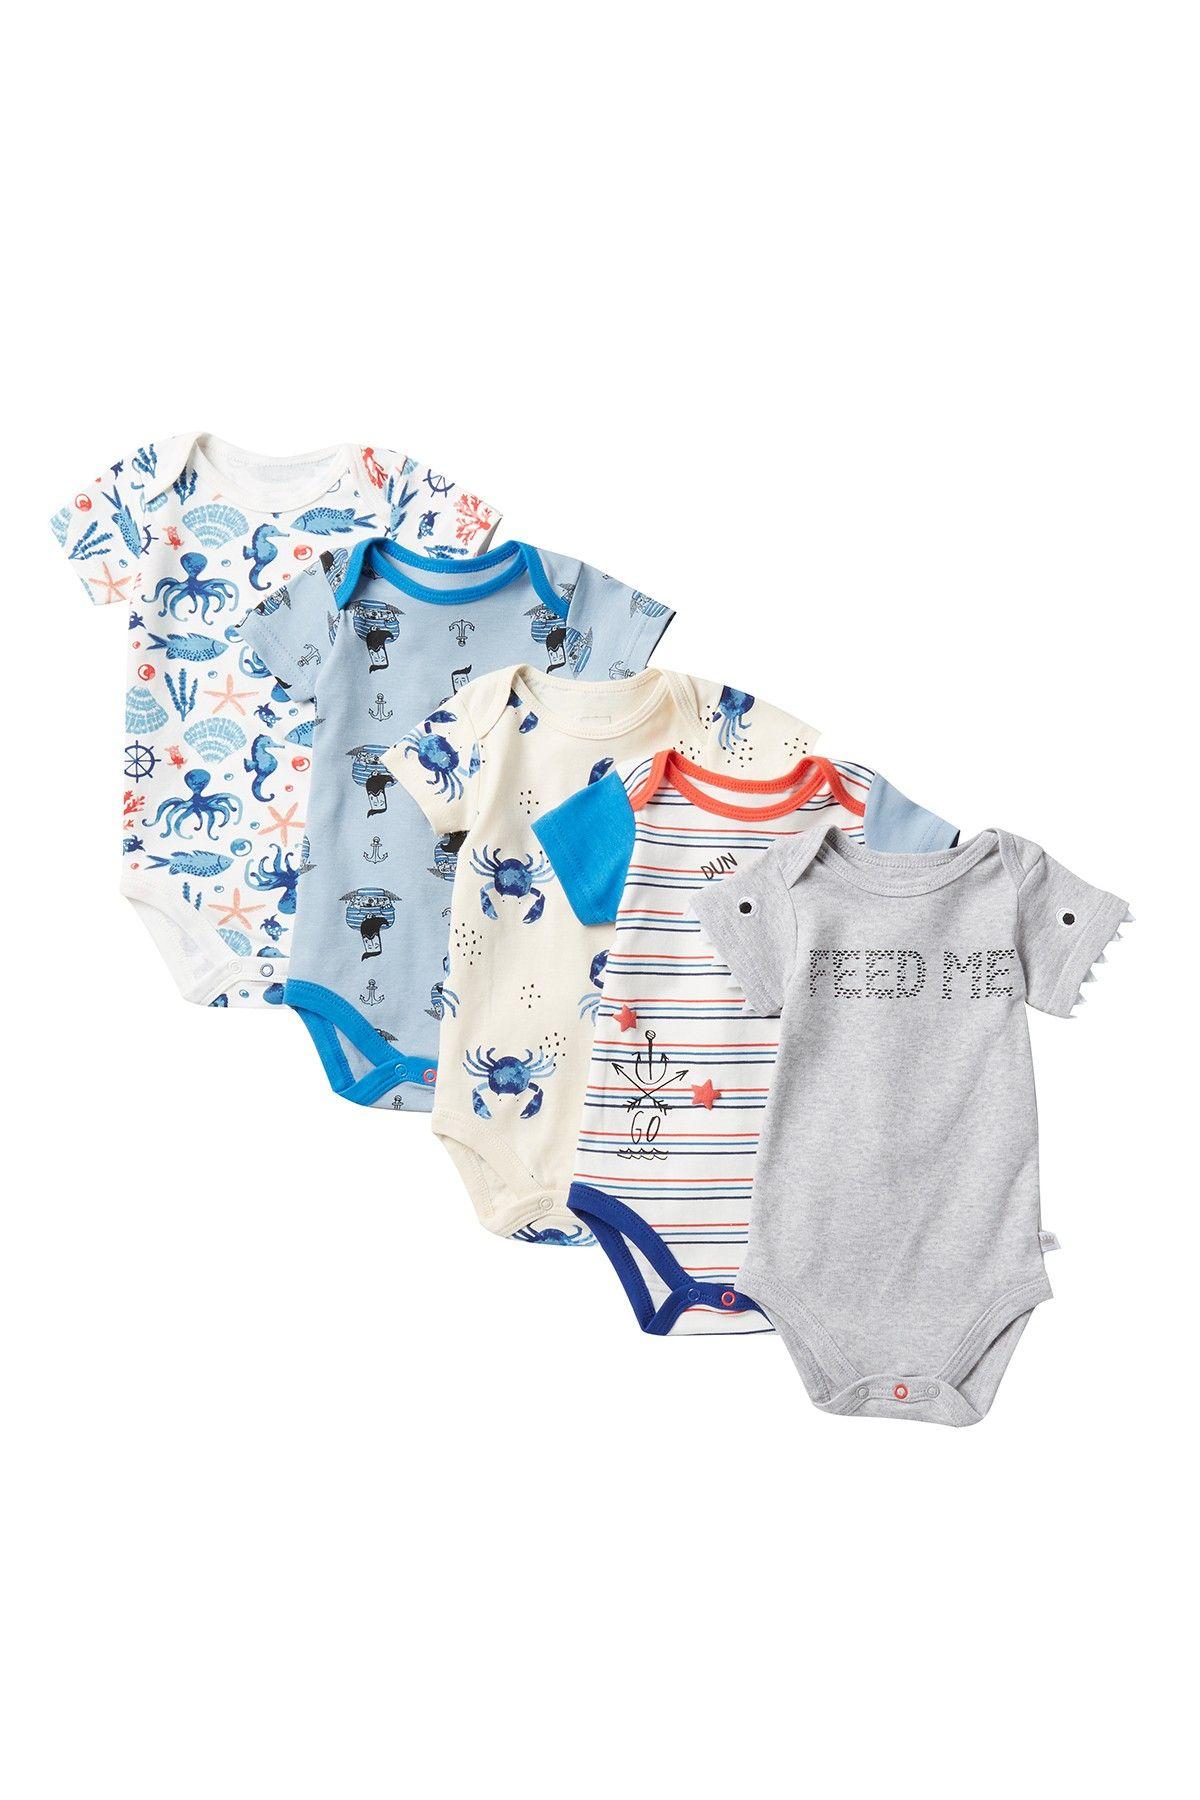 Rosie Pope | Assorted Bodysuits - Pack of 5 (Baby Boys #nordstromrack